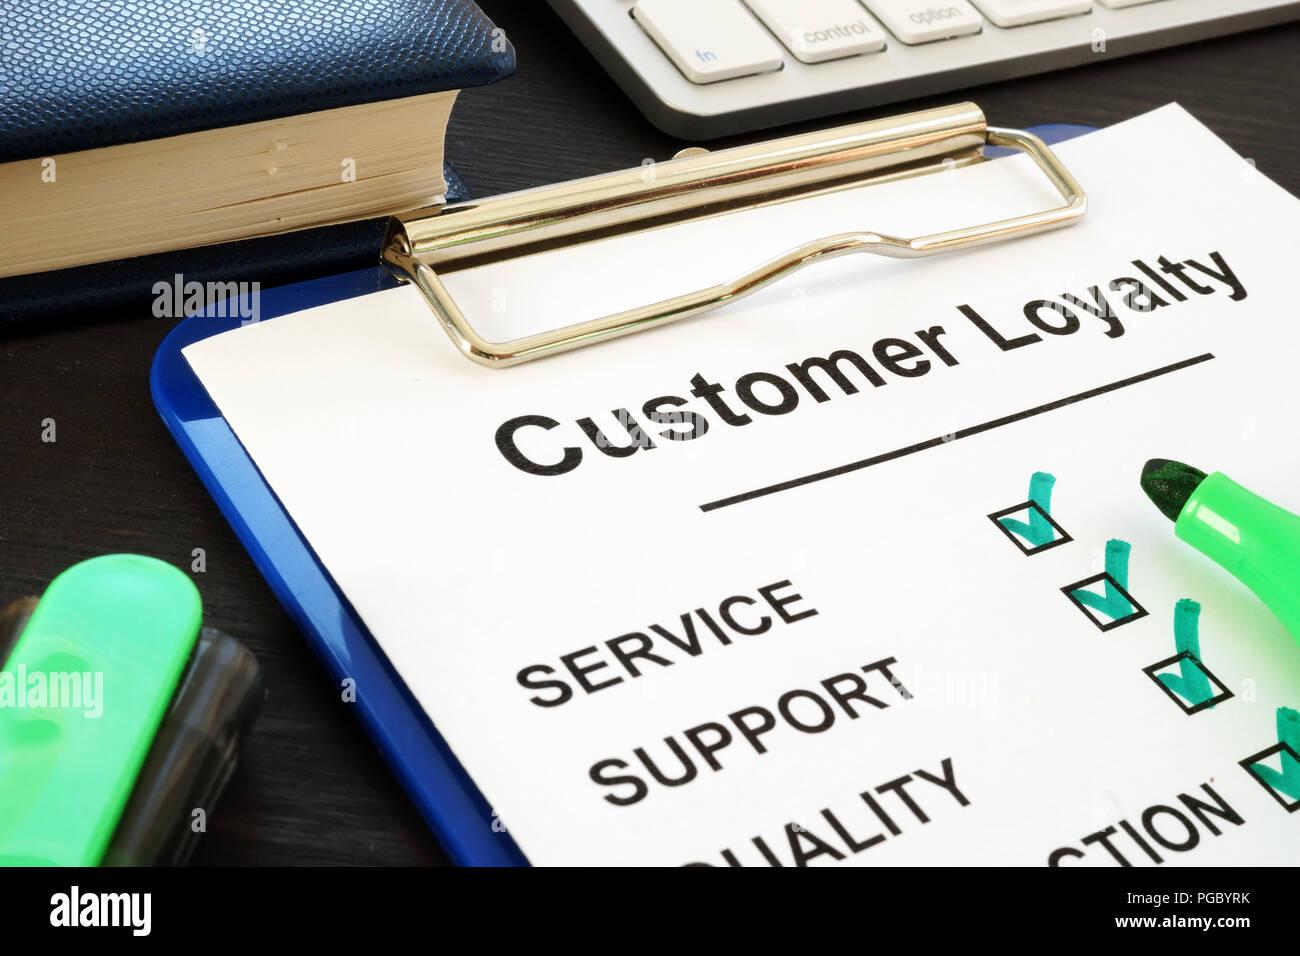 Customer Loyalty program quiz and pen. Service Satisfaction. - Stock Image